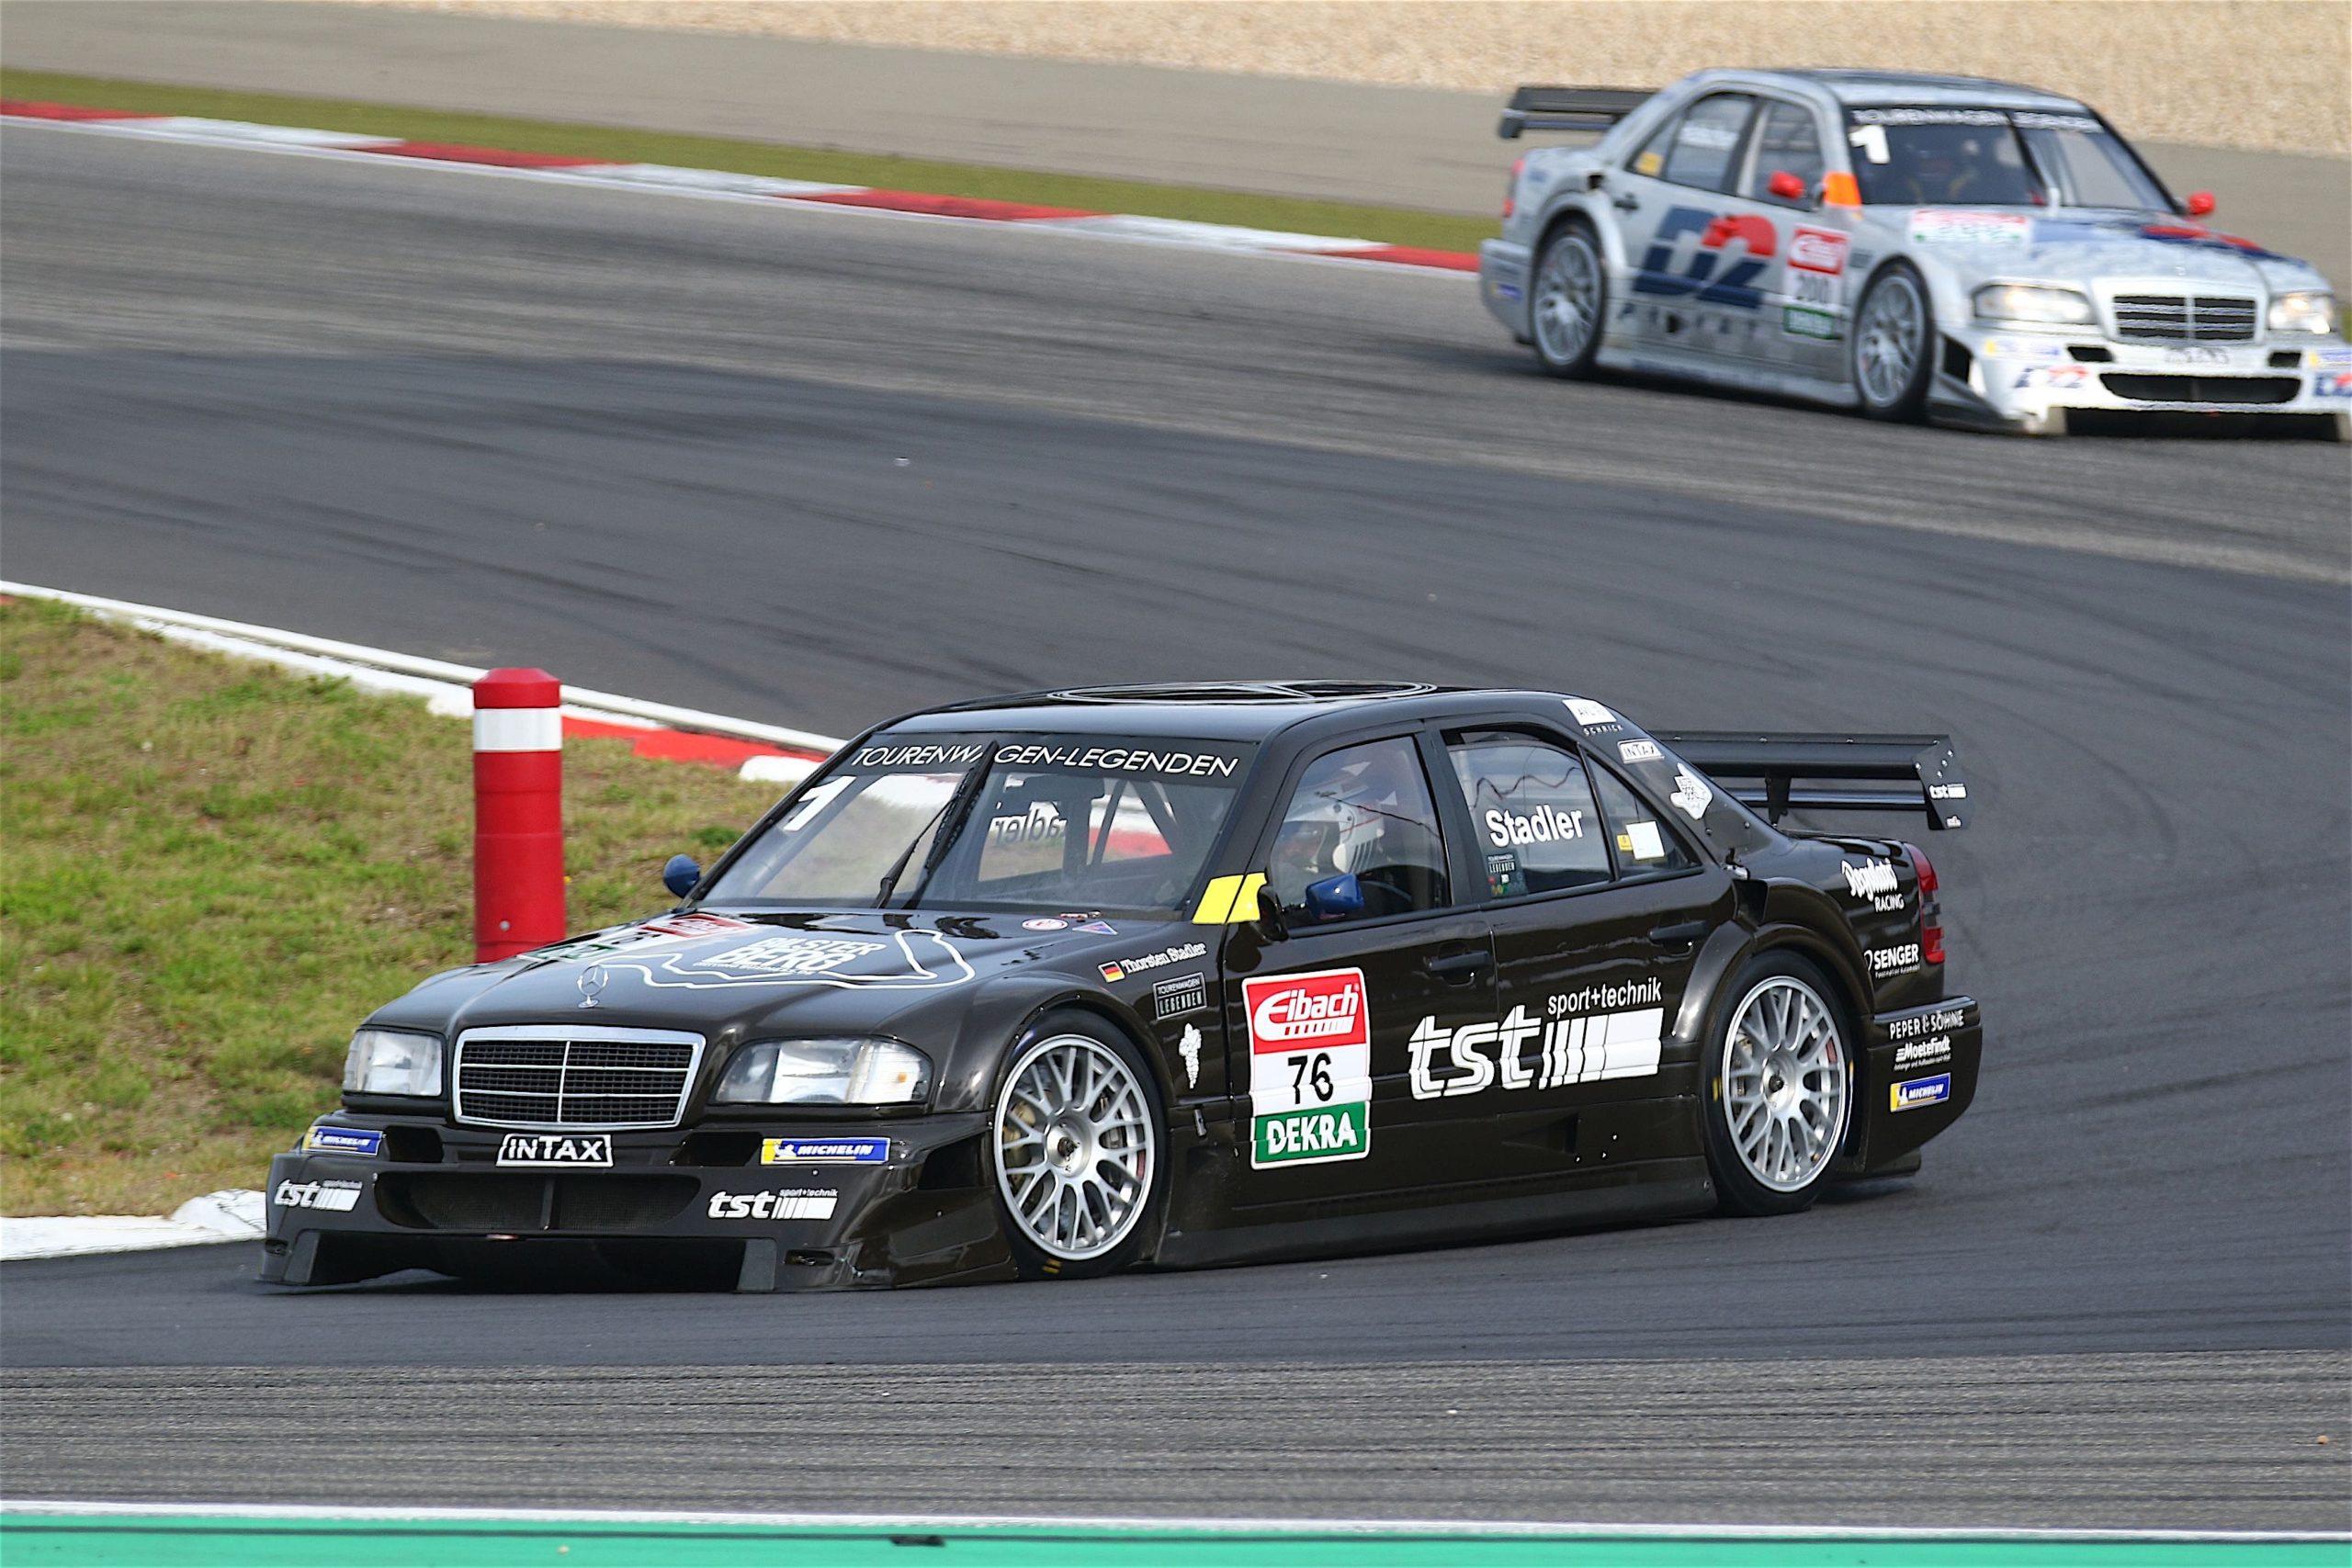 2021-DTM-Classic-Nuerburgring-tst-sport-und-technik-Mercedes-Benz-C-Klasse-Thorsten-Stadler-2116739